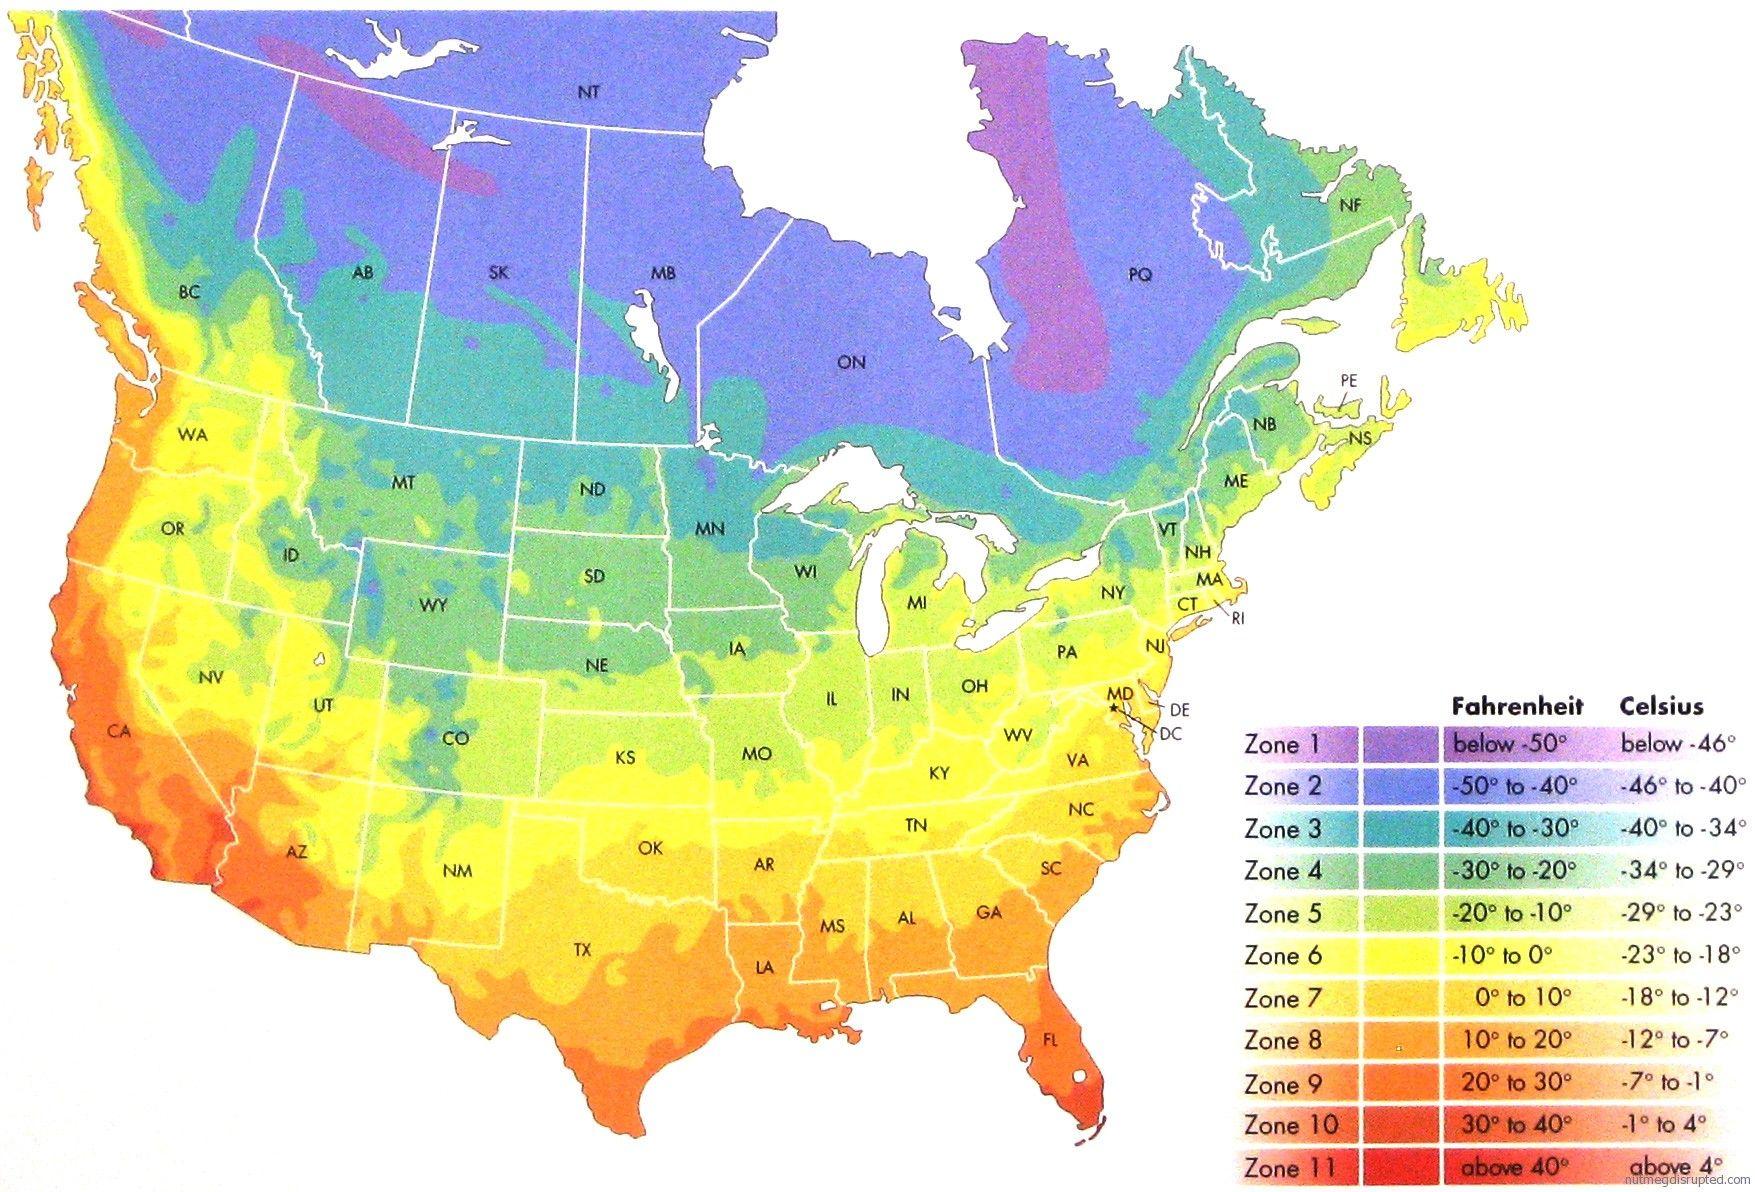 aa6a996edf943bf3780f6f59bffc2e33 - Map Of Gardening Zones North America